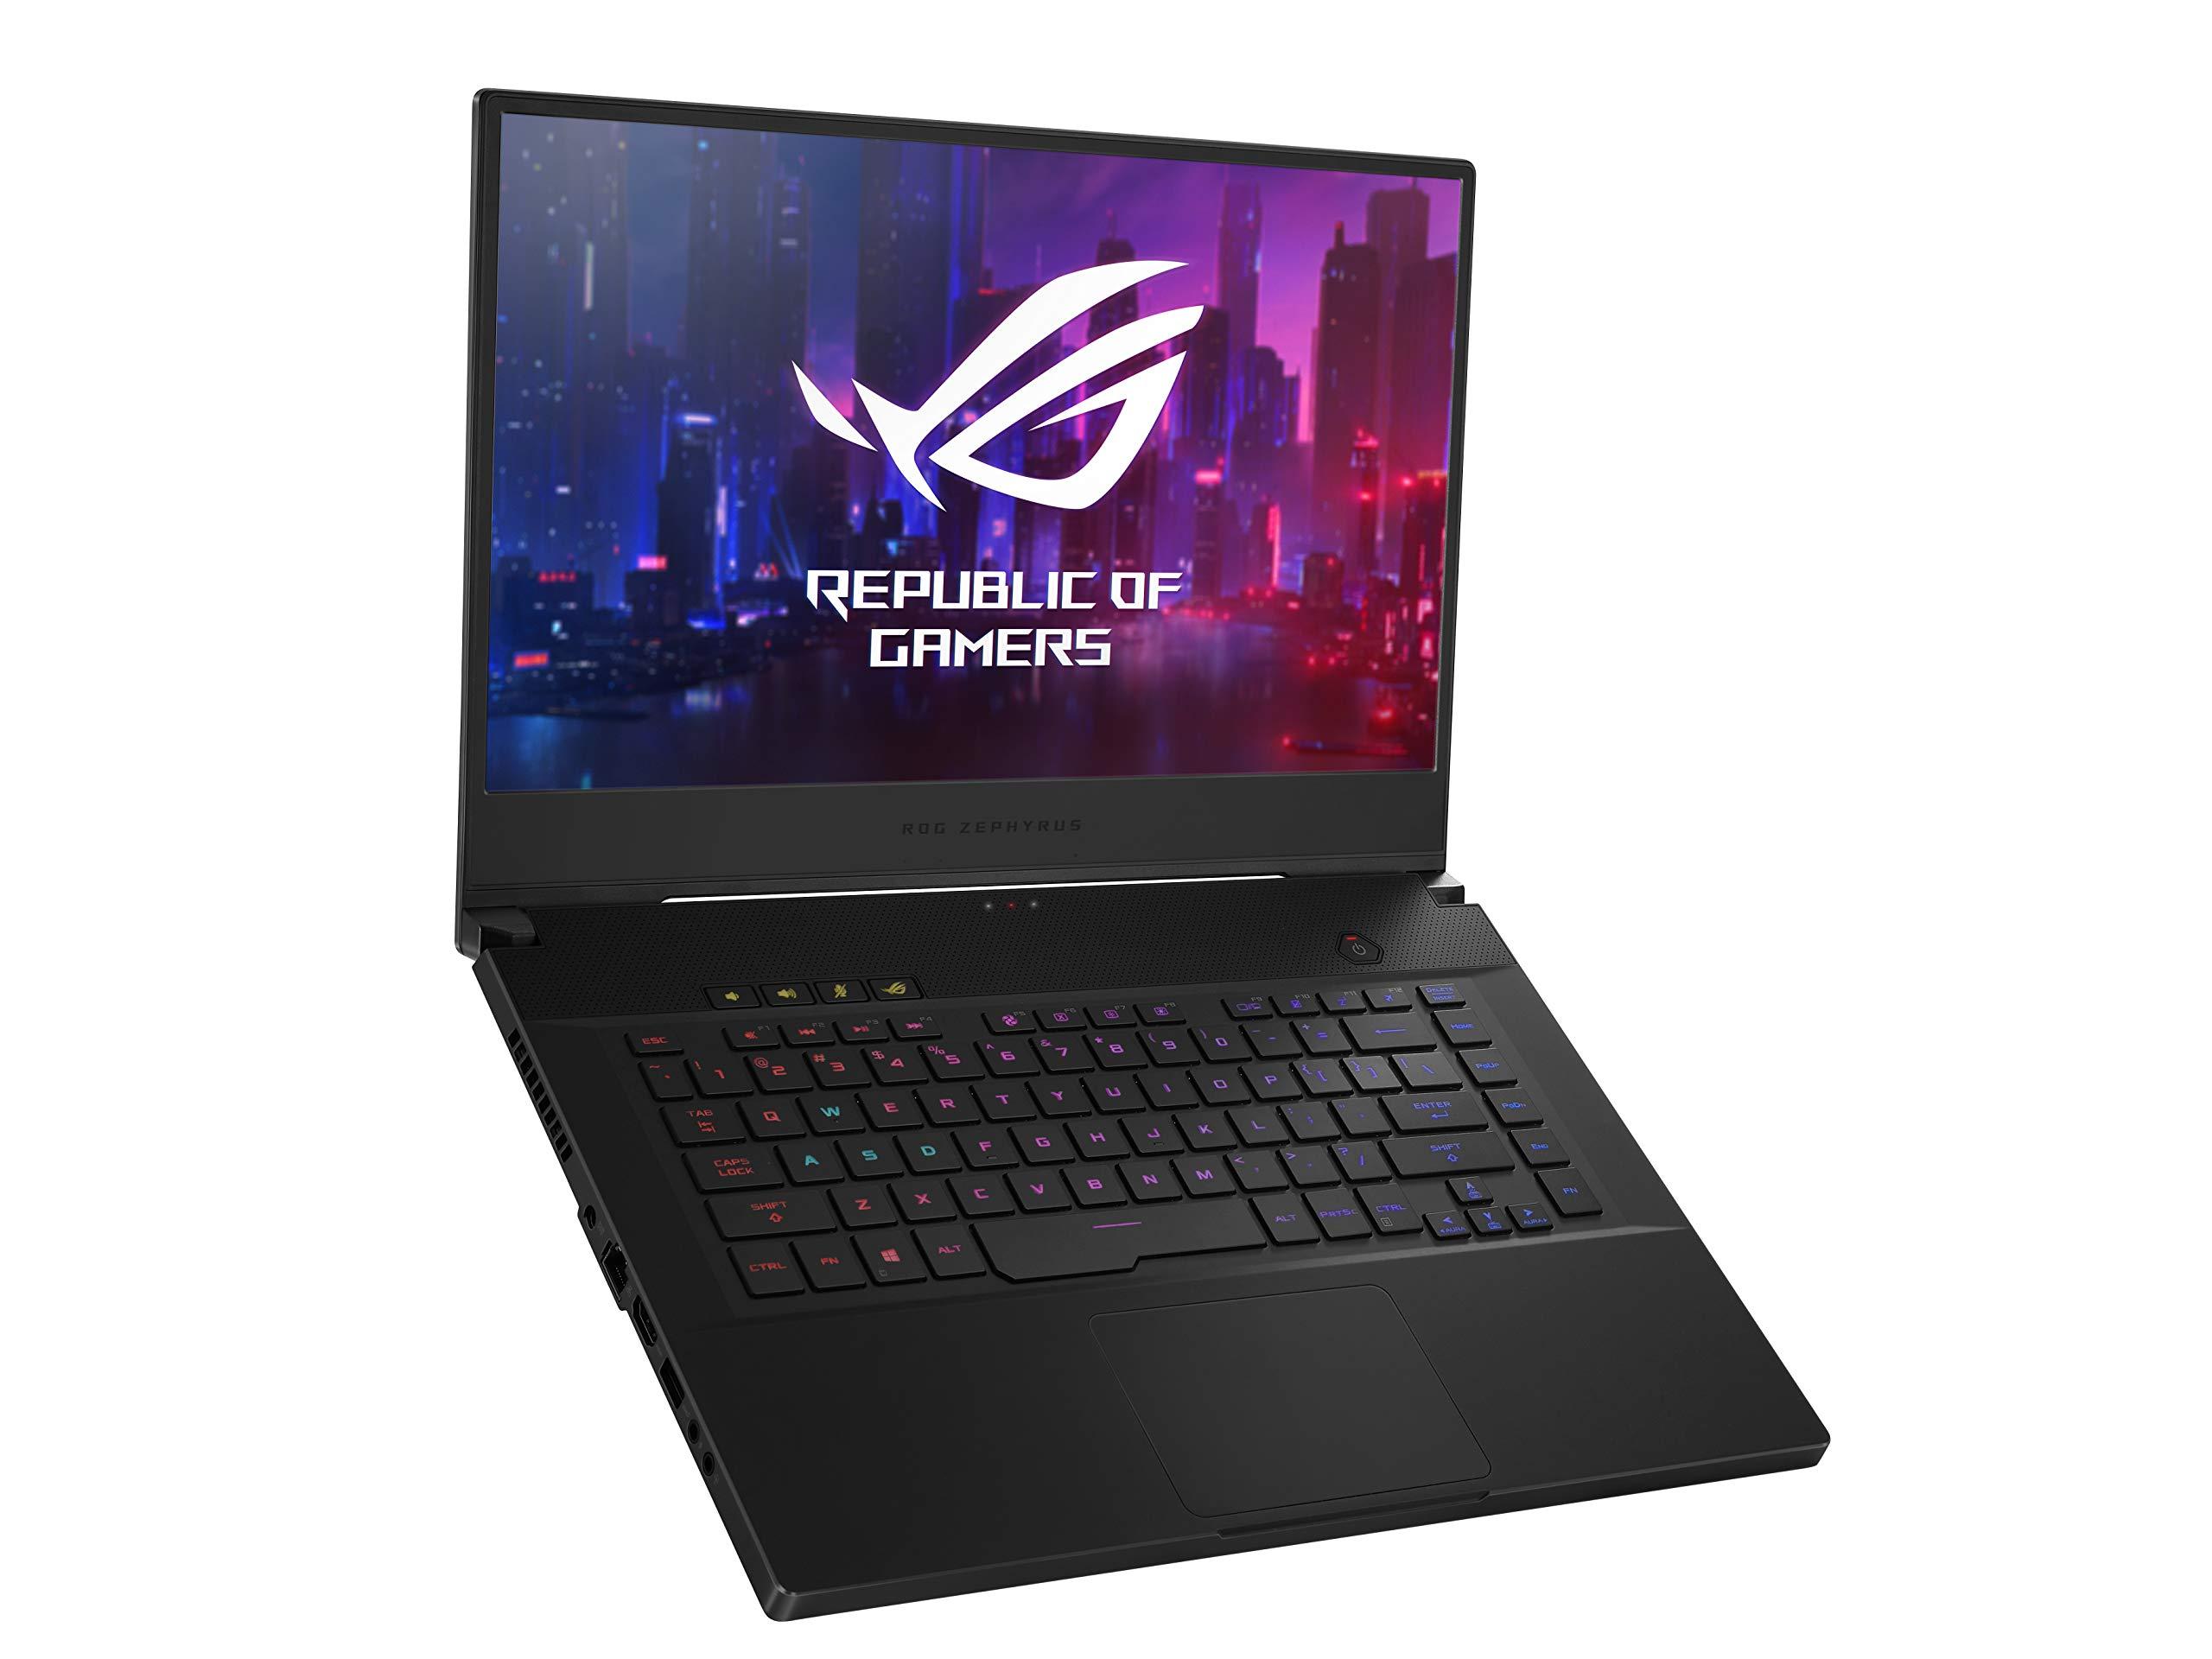 "ROG Zephyrus M Thin and Portable Gaming Laptop, 15.6"" 240Hz FHD IPS, NVIDIA GeForce RTX 2070, Intel Core i7-9750H, 16GB DDR4 RAM, 1TB PCIe SSD, Per-Key RGB, Windows 10 Home, GU502GW-AH76"